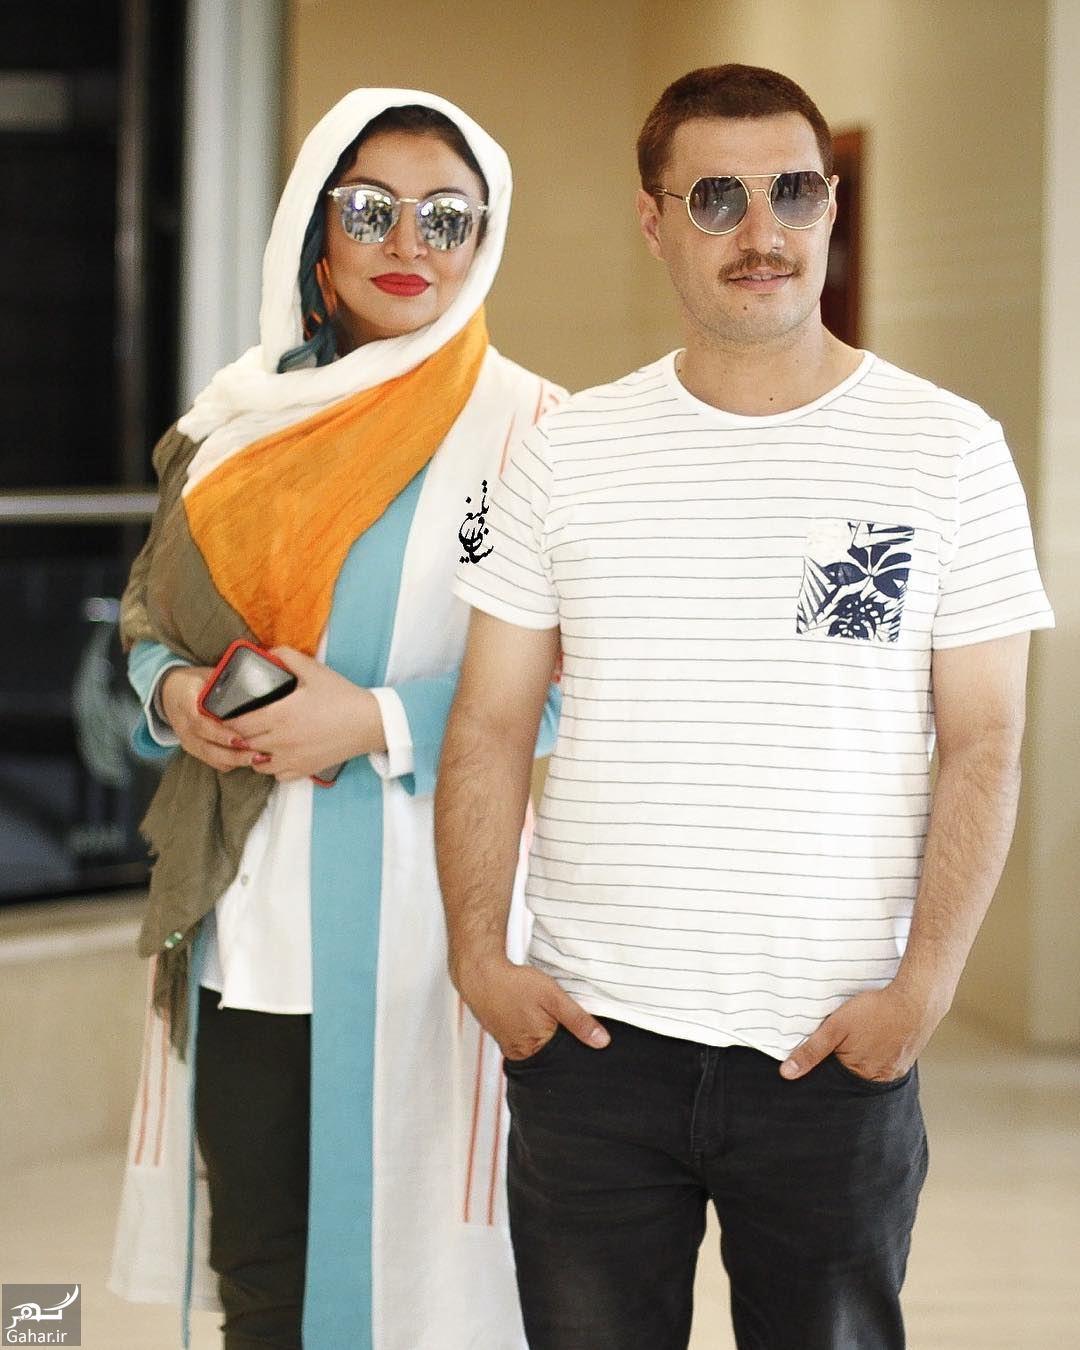 907815 Gahar ir عکس/ تیپ متفاوت جواد عزتی و همسرش در رونمایی از پوستر فیلم آینه بغل